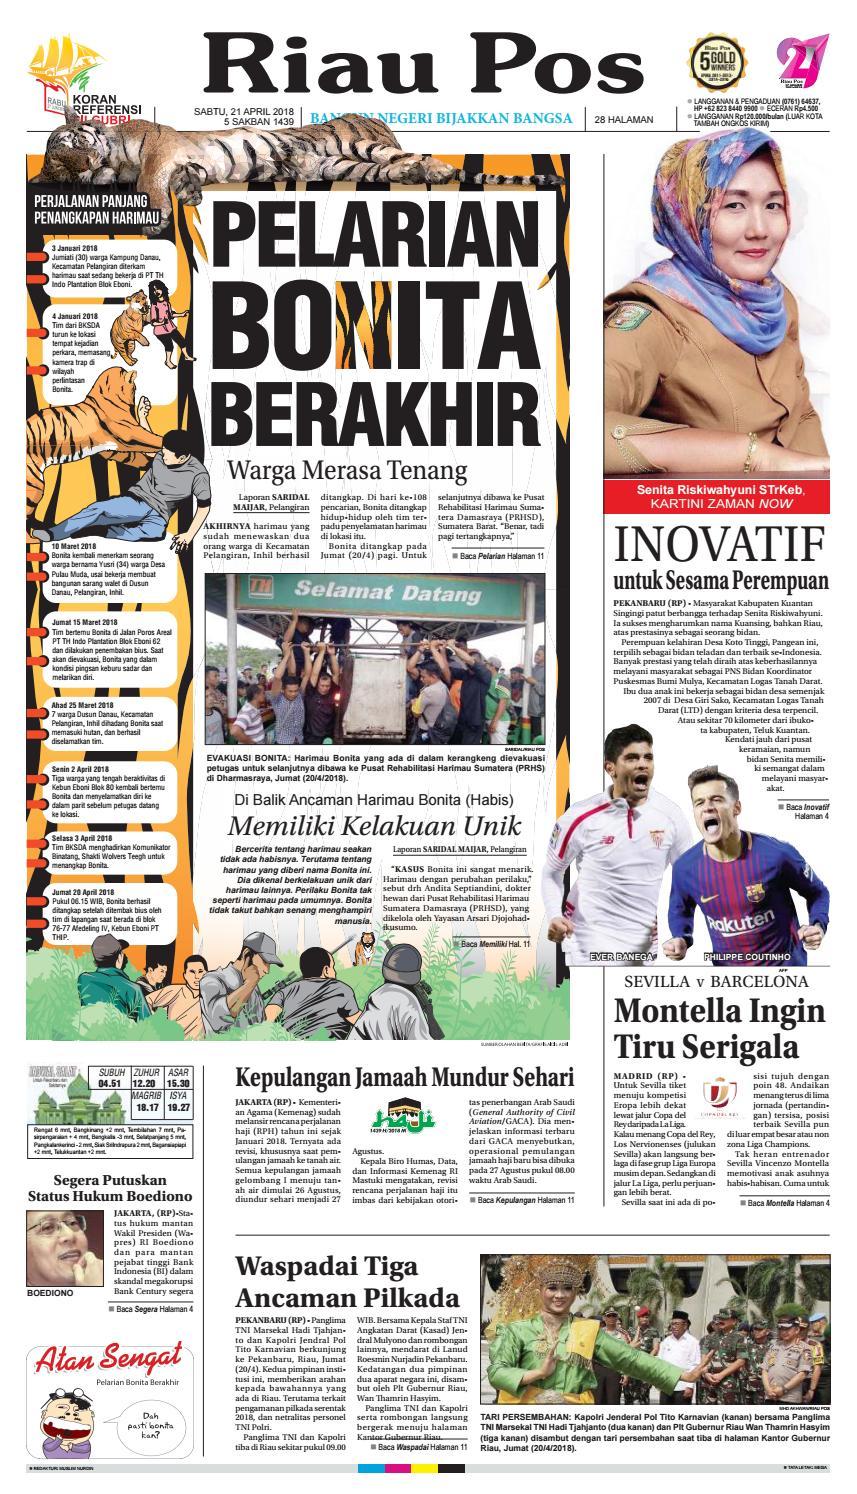 2018 04 21 By Riau Pos Issuu Rejeki Anak Soleh Mamypoko Standar M34